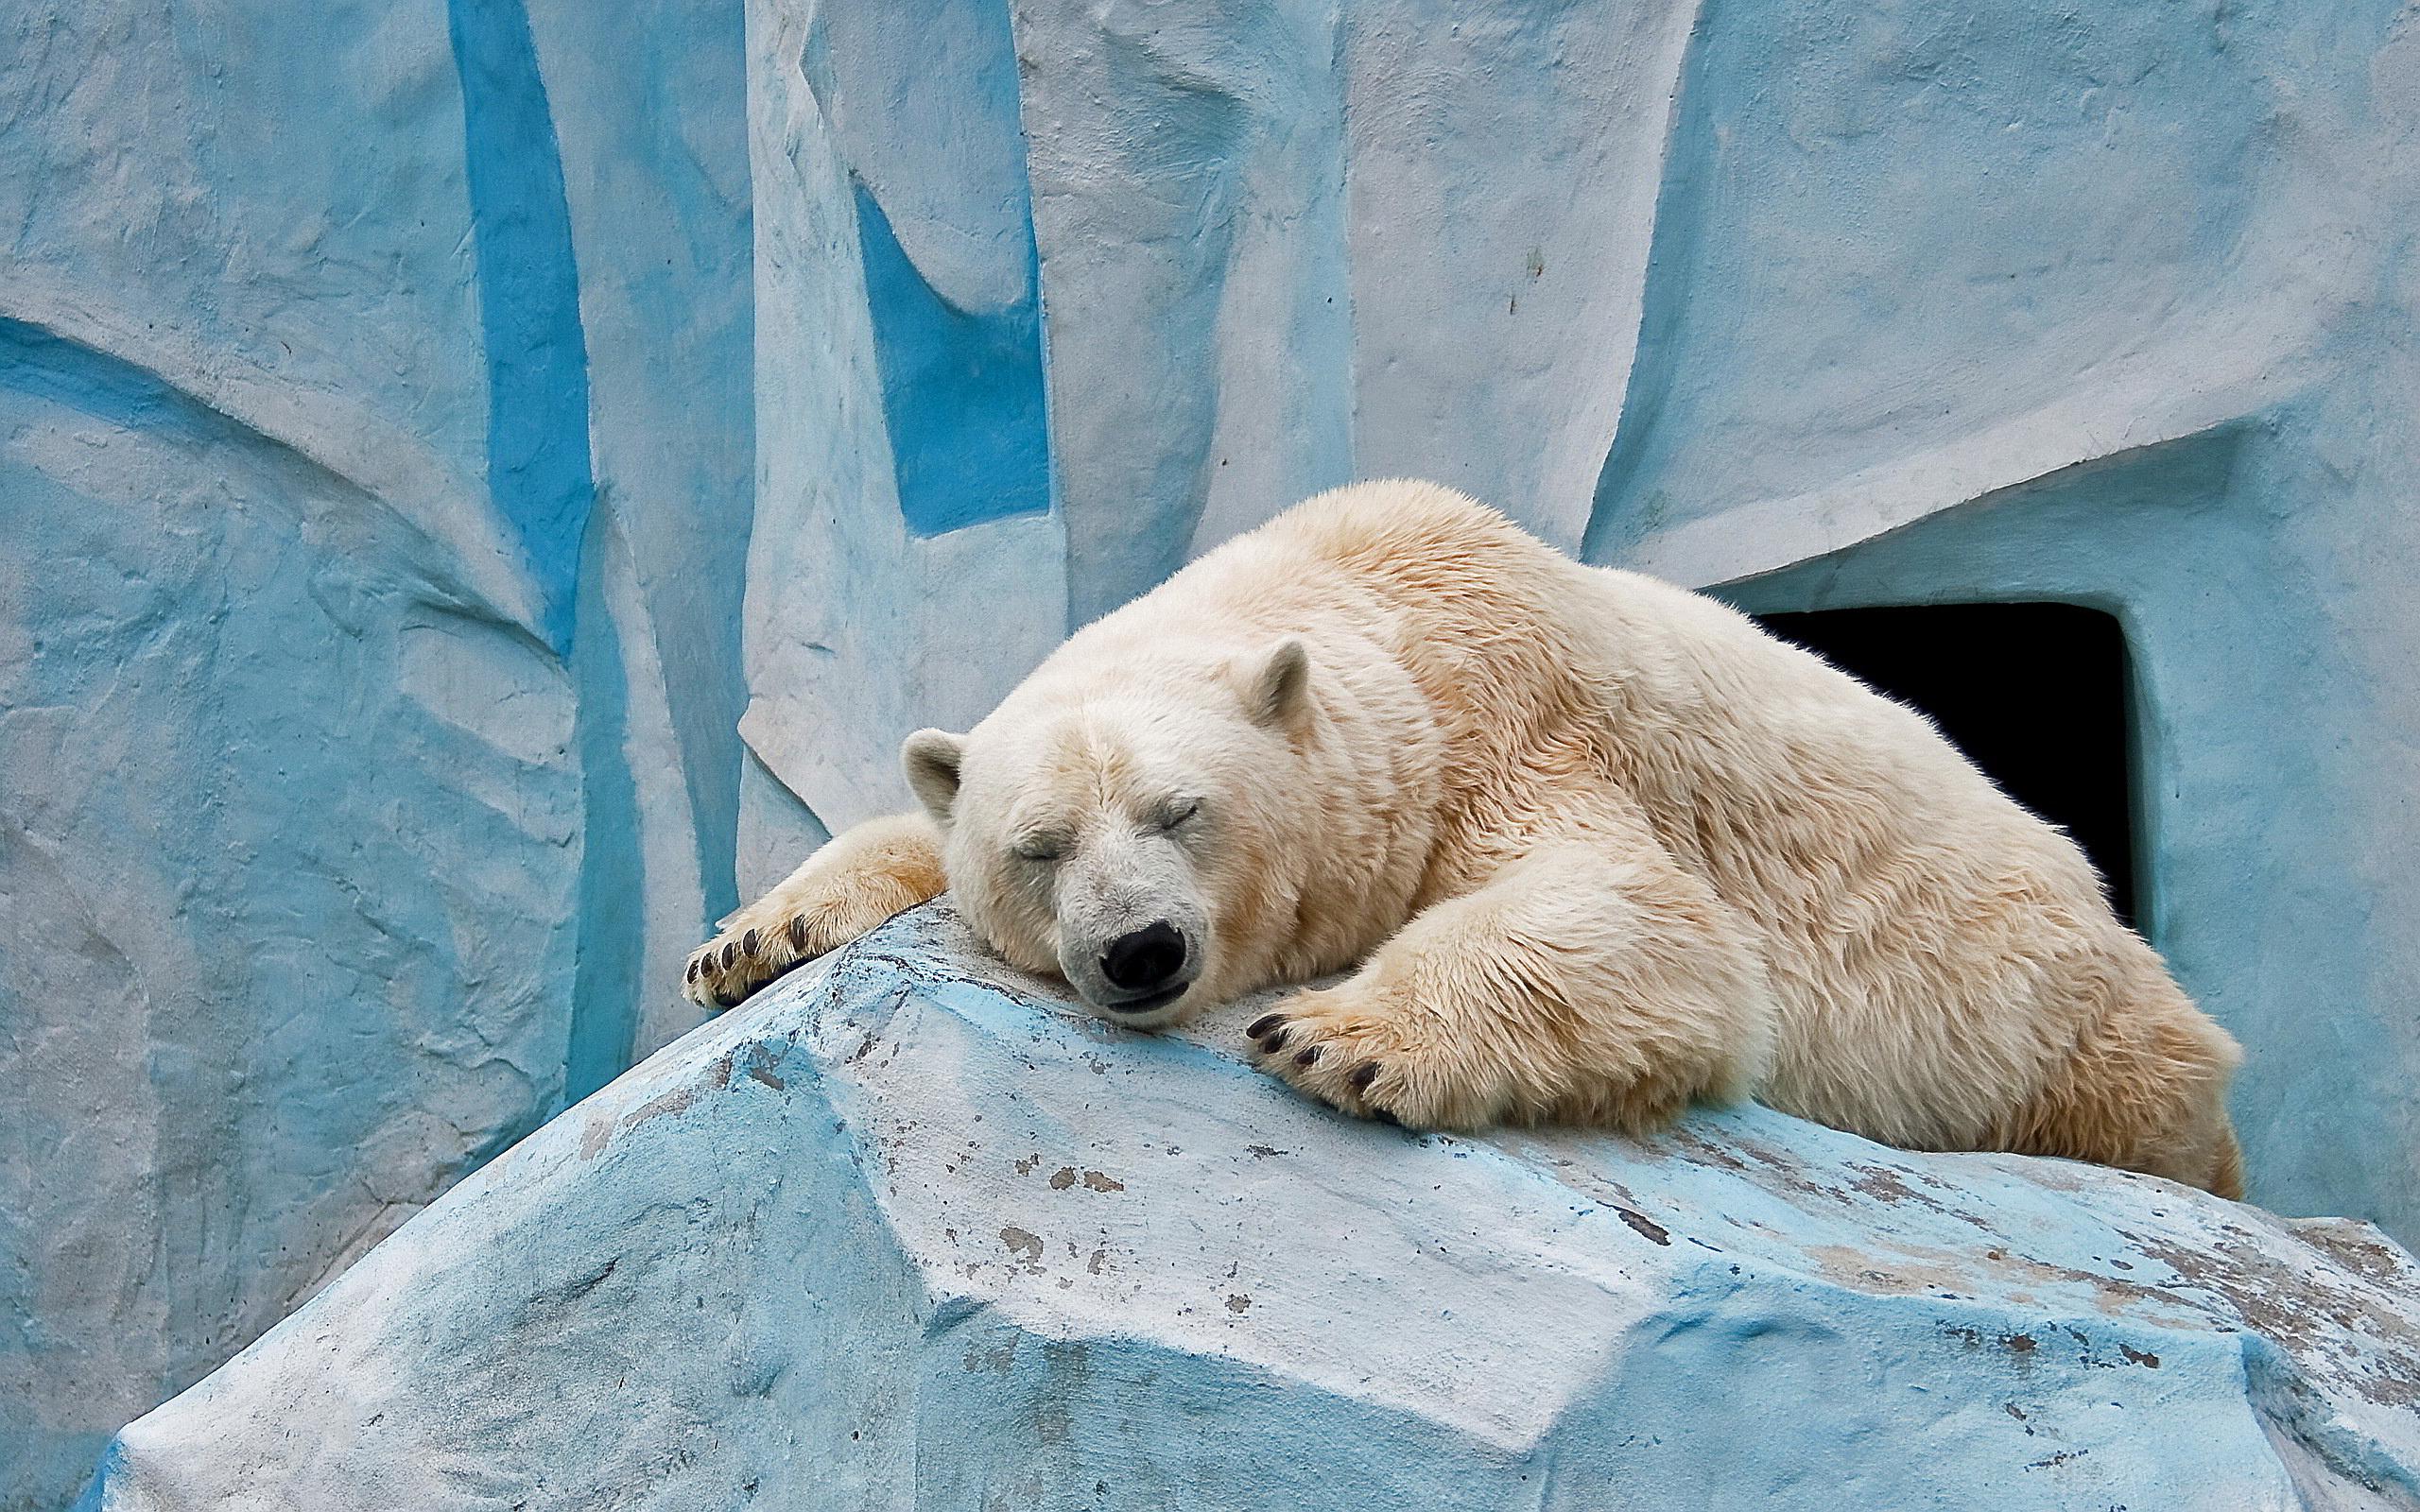 Ice bear sleeping wallpaper 2560x1600 13461 2560x1600